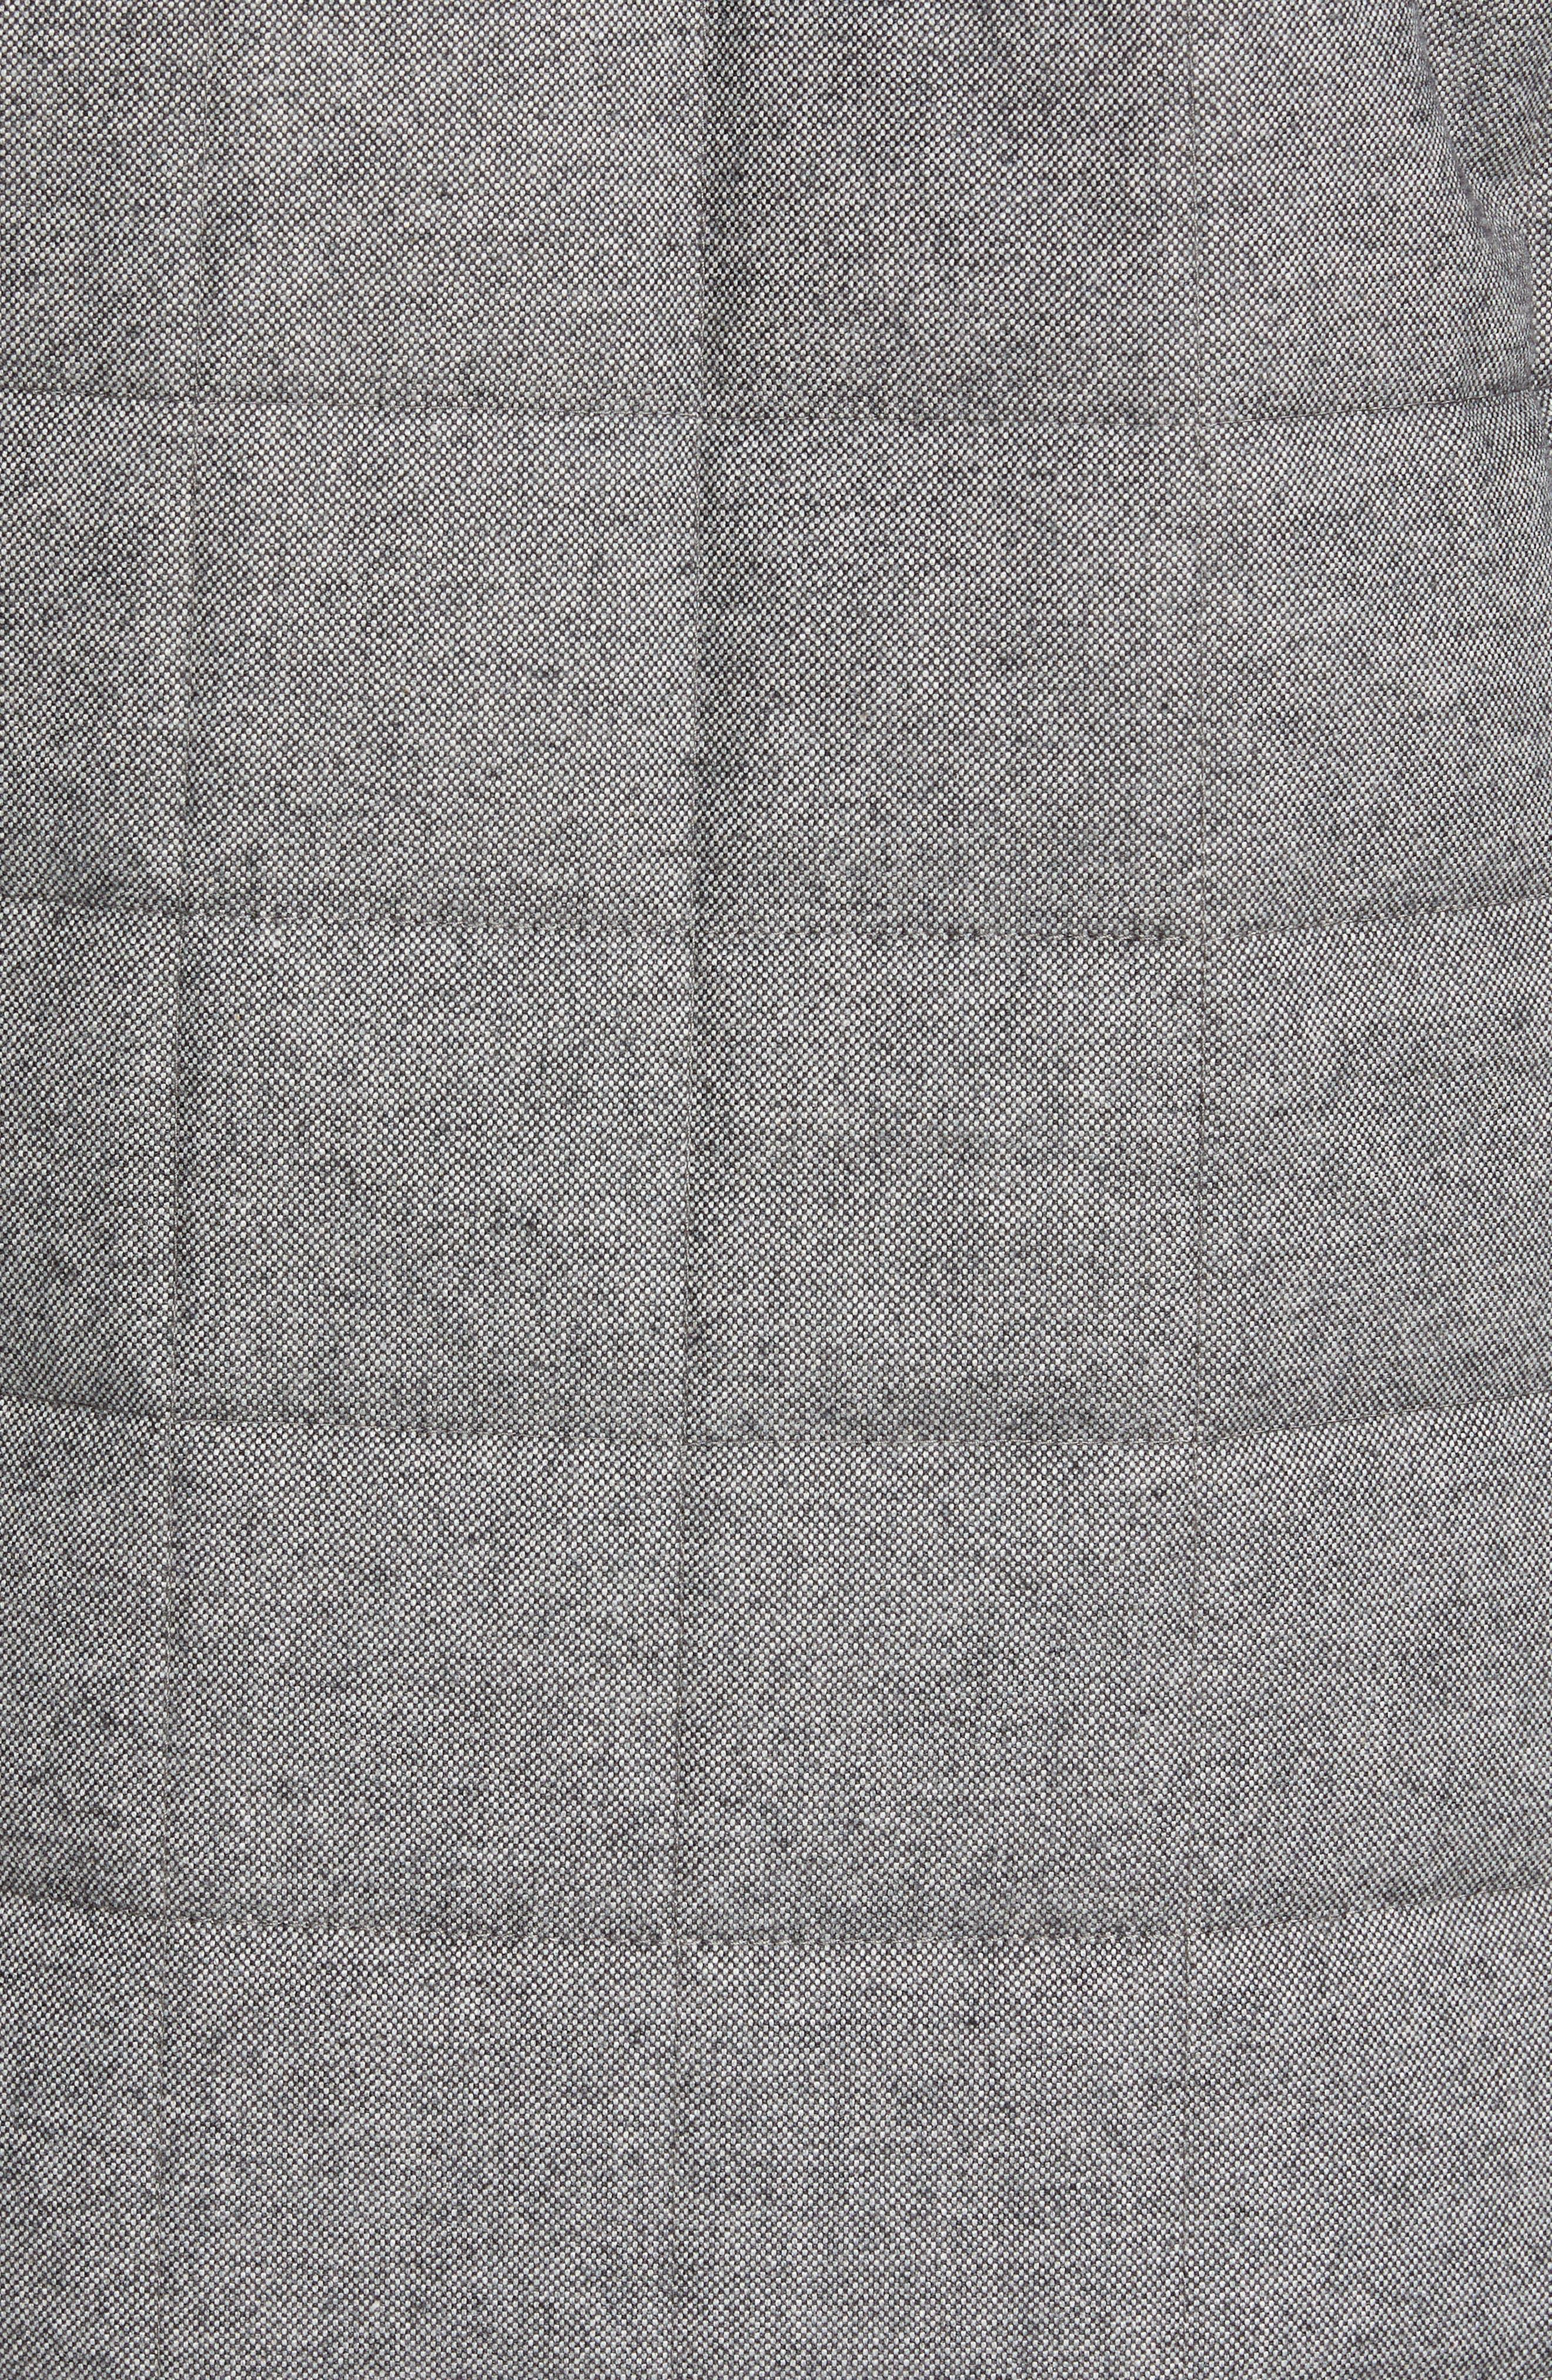 Quilted Herringbone Shirt Jacket,                             Alternate thumbnail 7, color,                             GREY COTTON HERRINGBONE